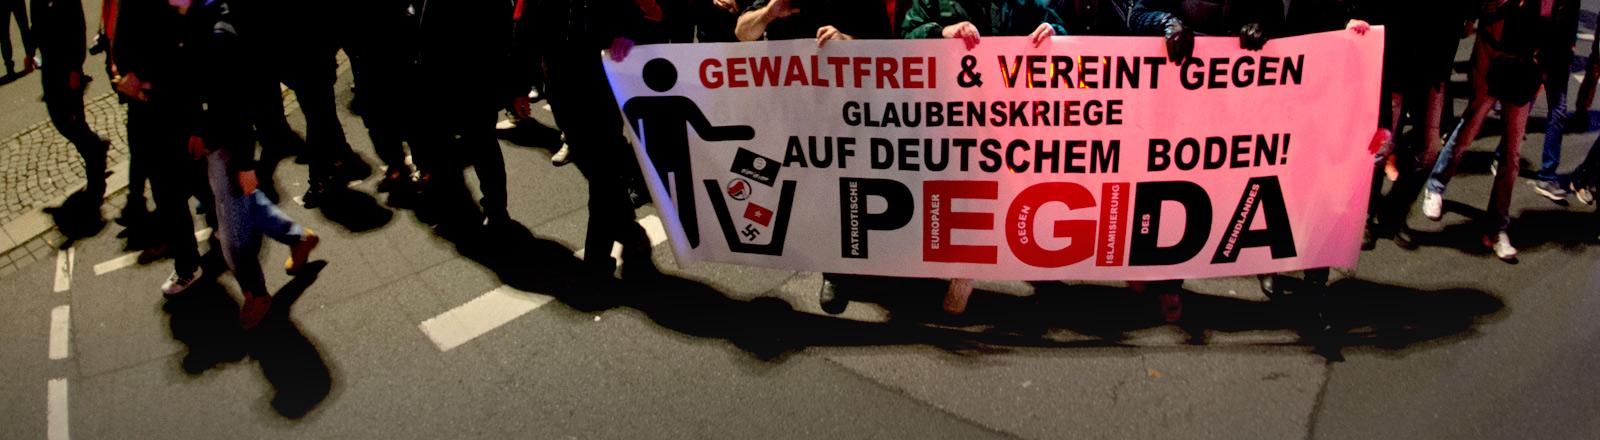 Pegida-Demonstration in Dresden. Demonstranten halt ein Plakat hoch.